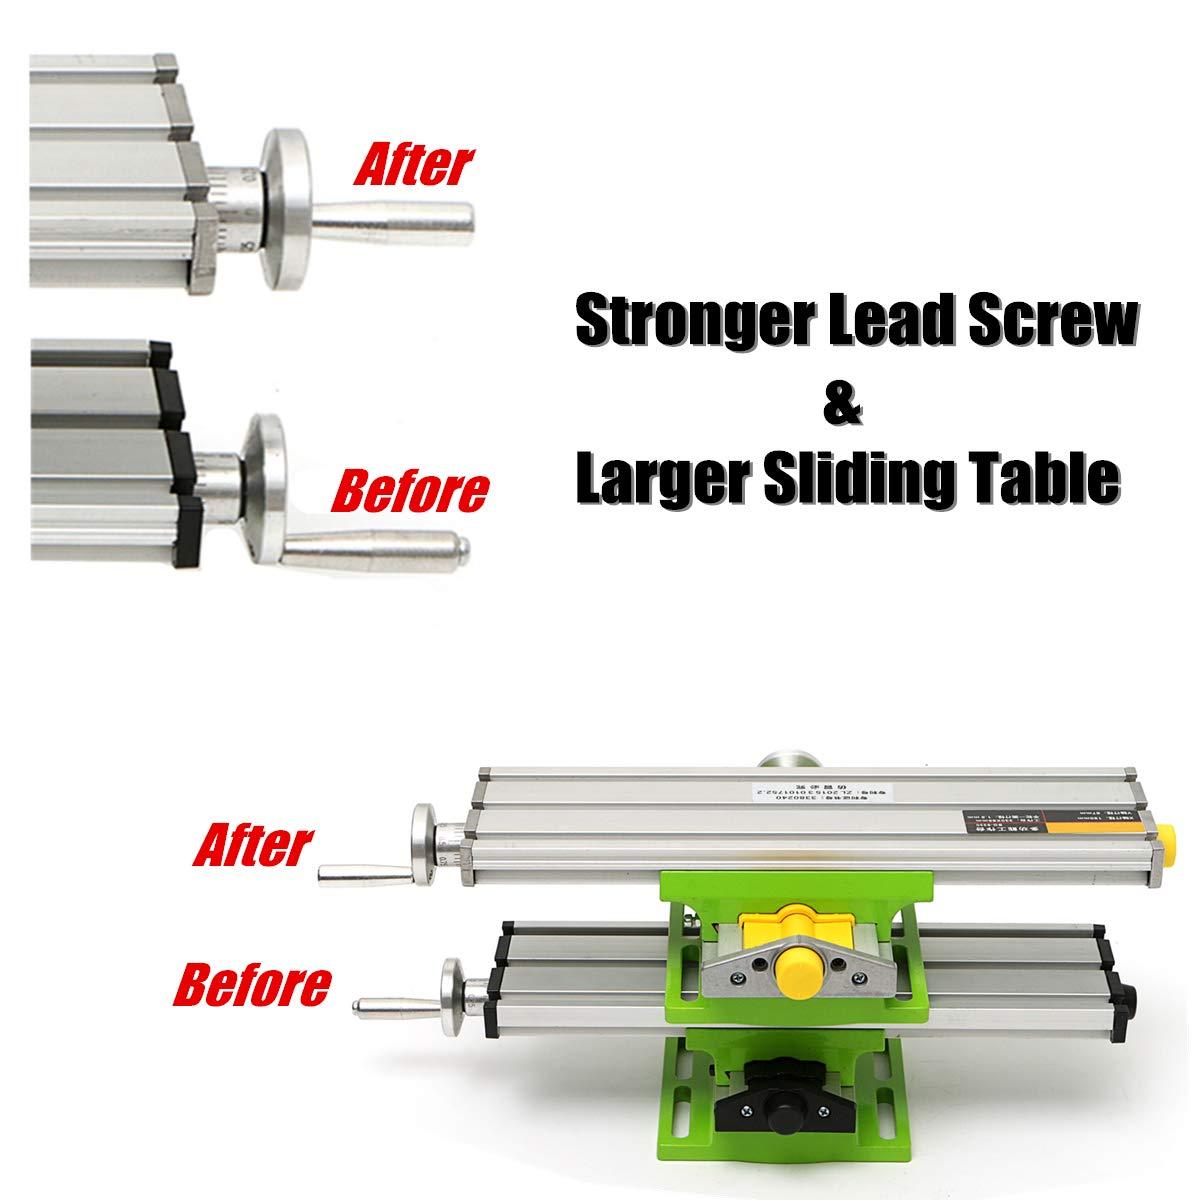 MINIQ BG6330 Mini Precision Milling Machine Worktable Multifunction Drill Vise Fixture Working Table